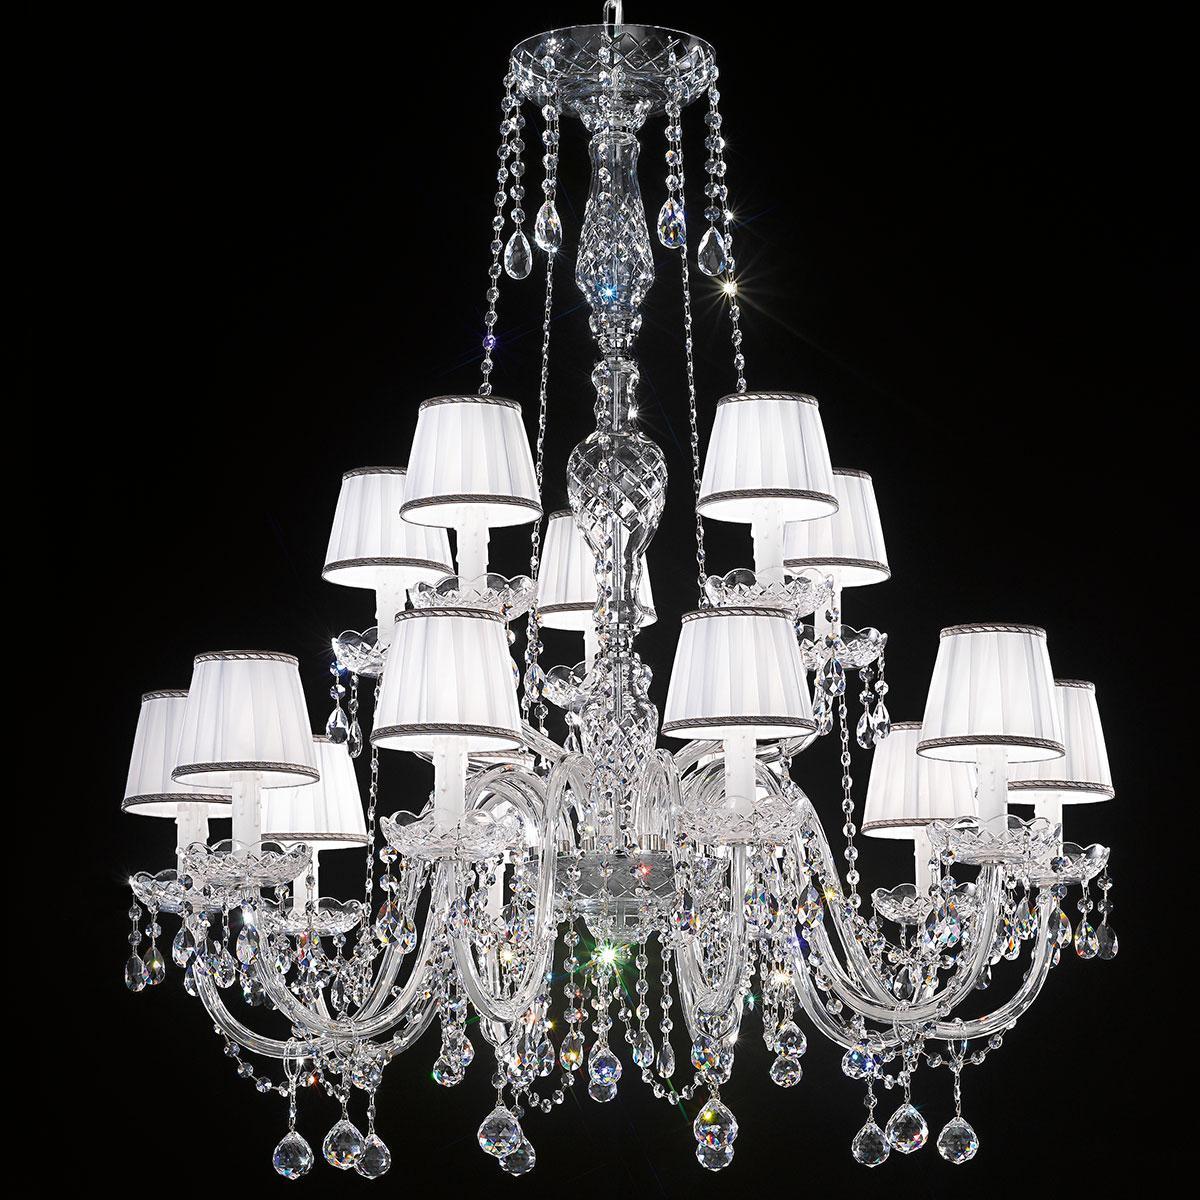 """Barbieri"" lampara veneciana en cristal con pantallas - 10+5 luces - transparente con cristal Asfour"